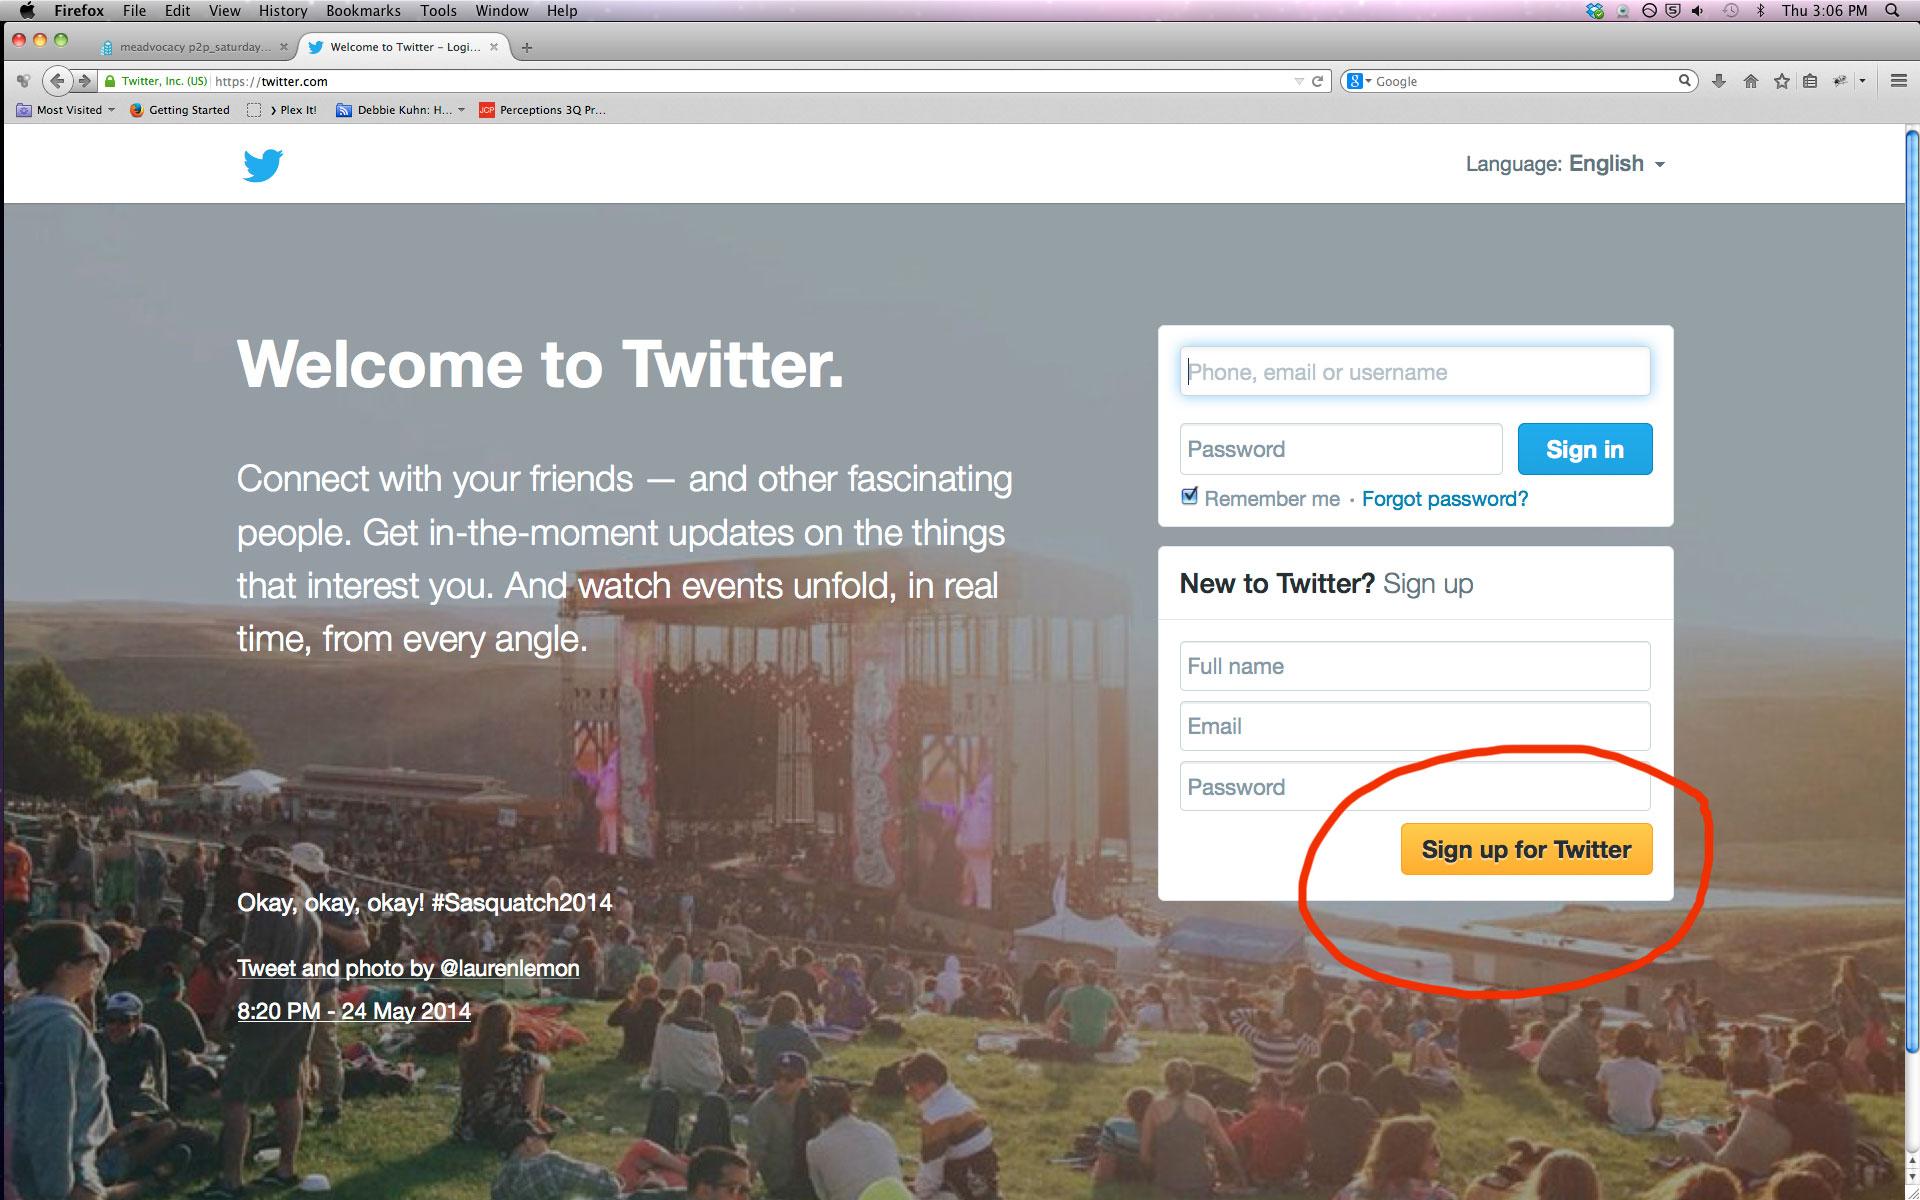 01Twitter-Home-Screen.jpg